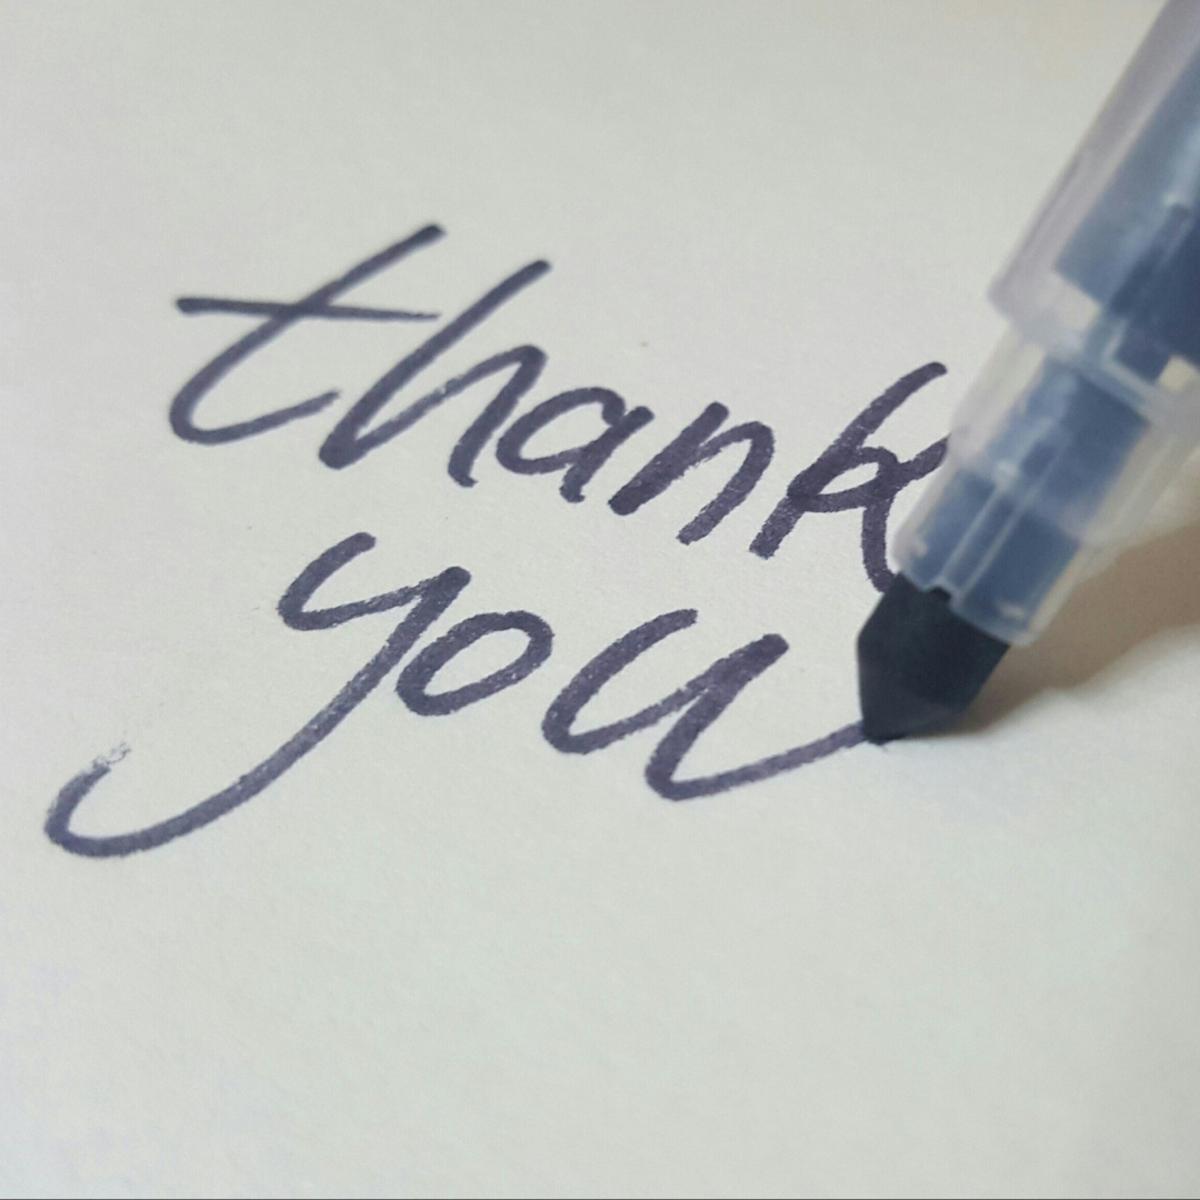 Everyone appeciates a thank you.